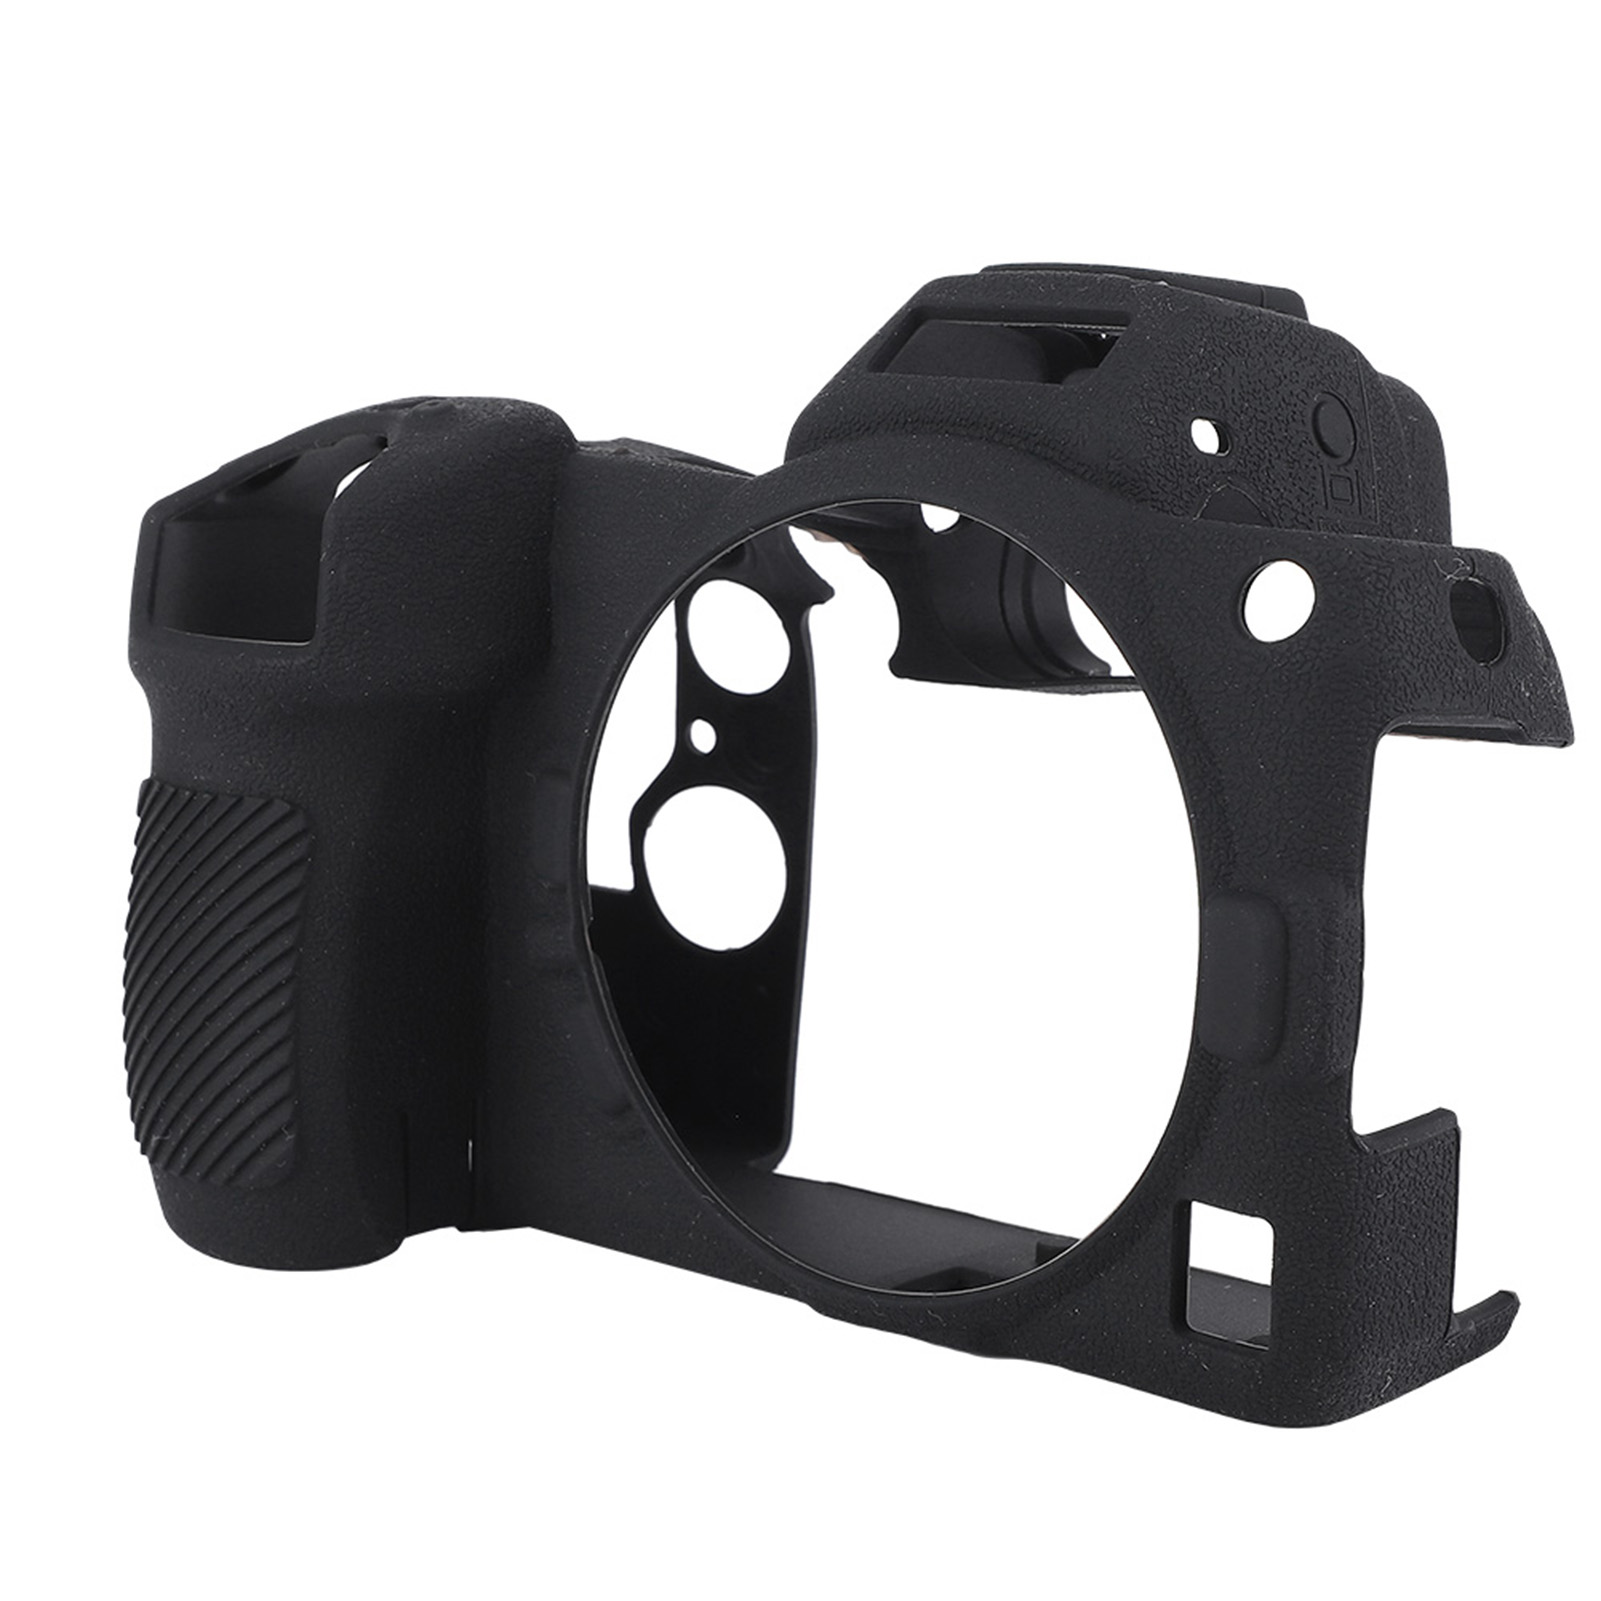 Funda-de-Silicona-Suave-a-Prueba-De-Golpes-Funda-Protectora-De-Camara-Para-Nikon-D5300-D7500-D3400 miniatura 35